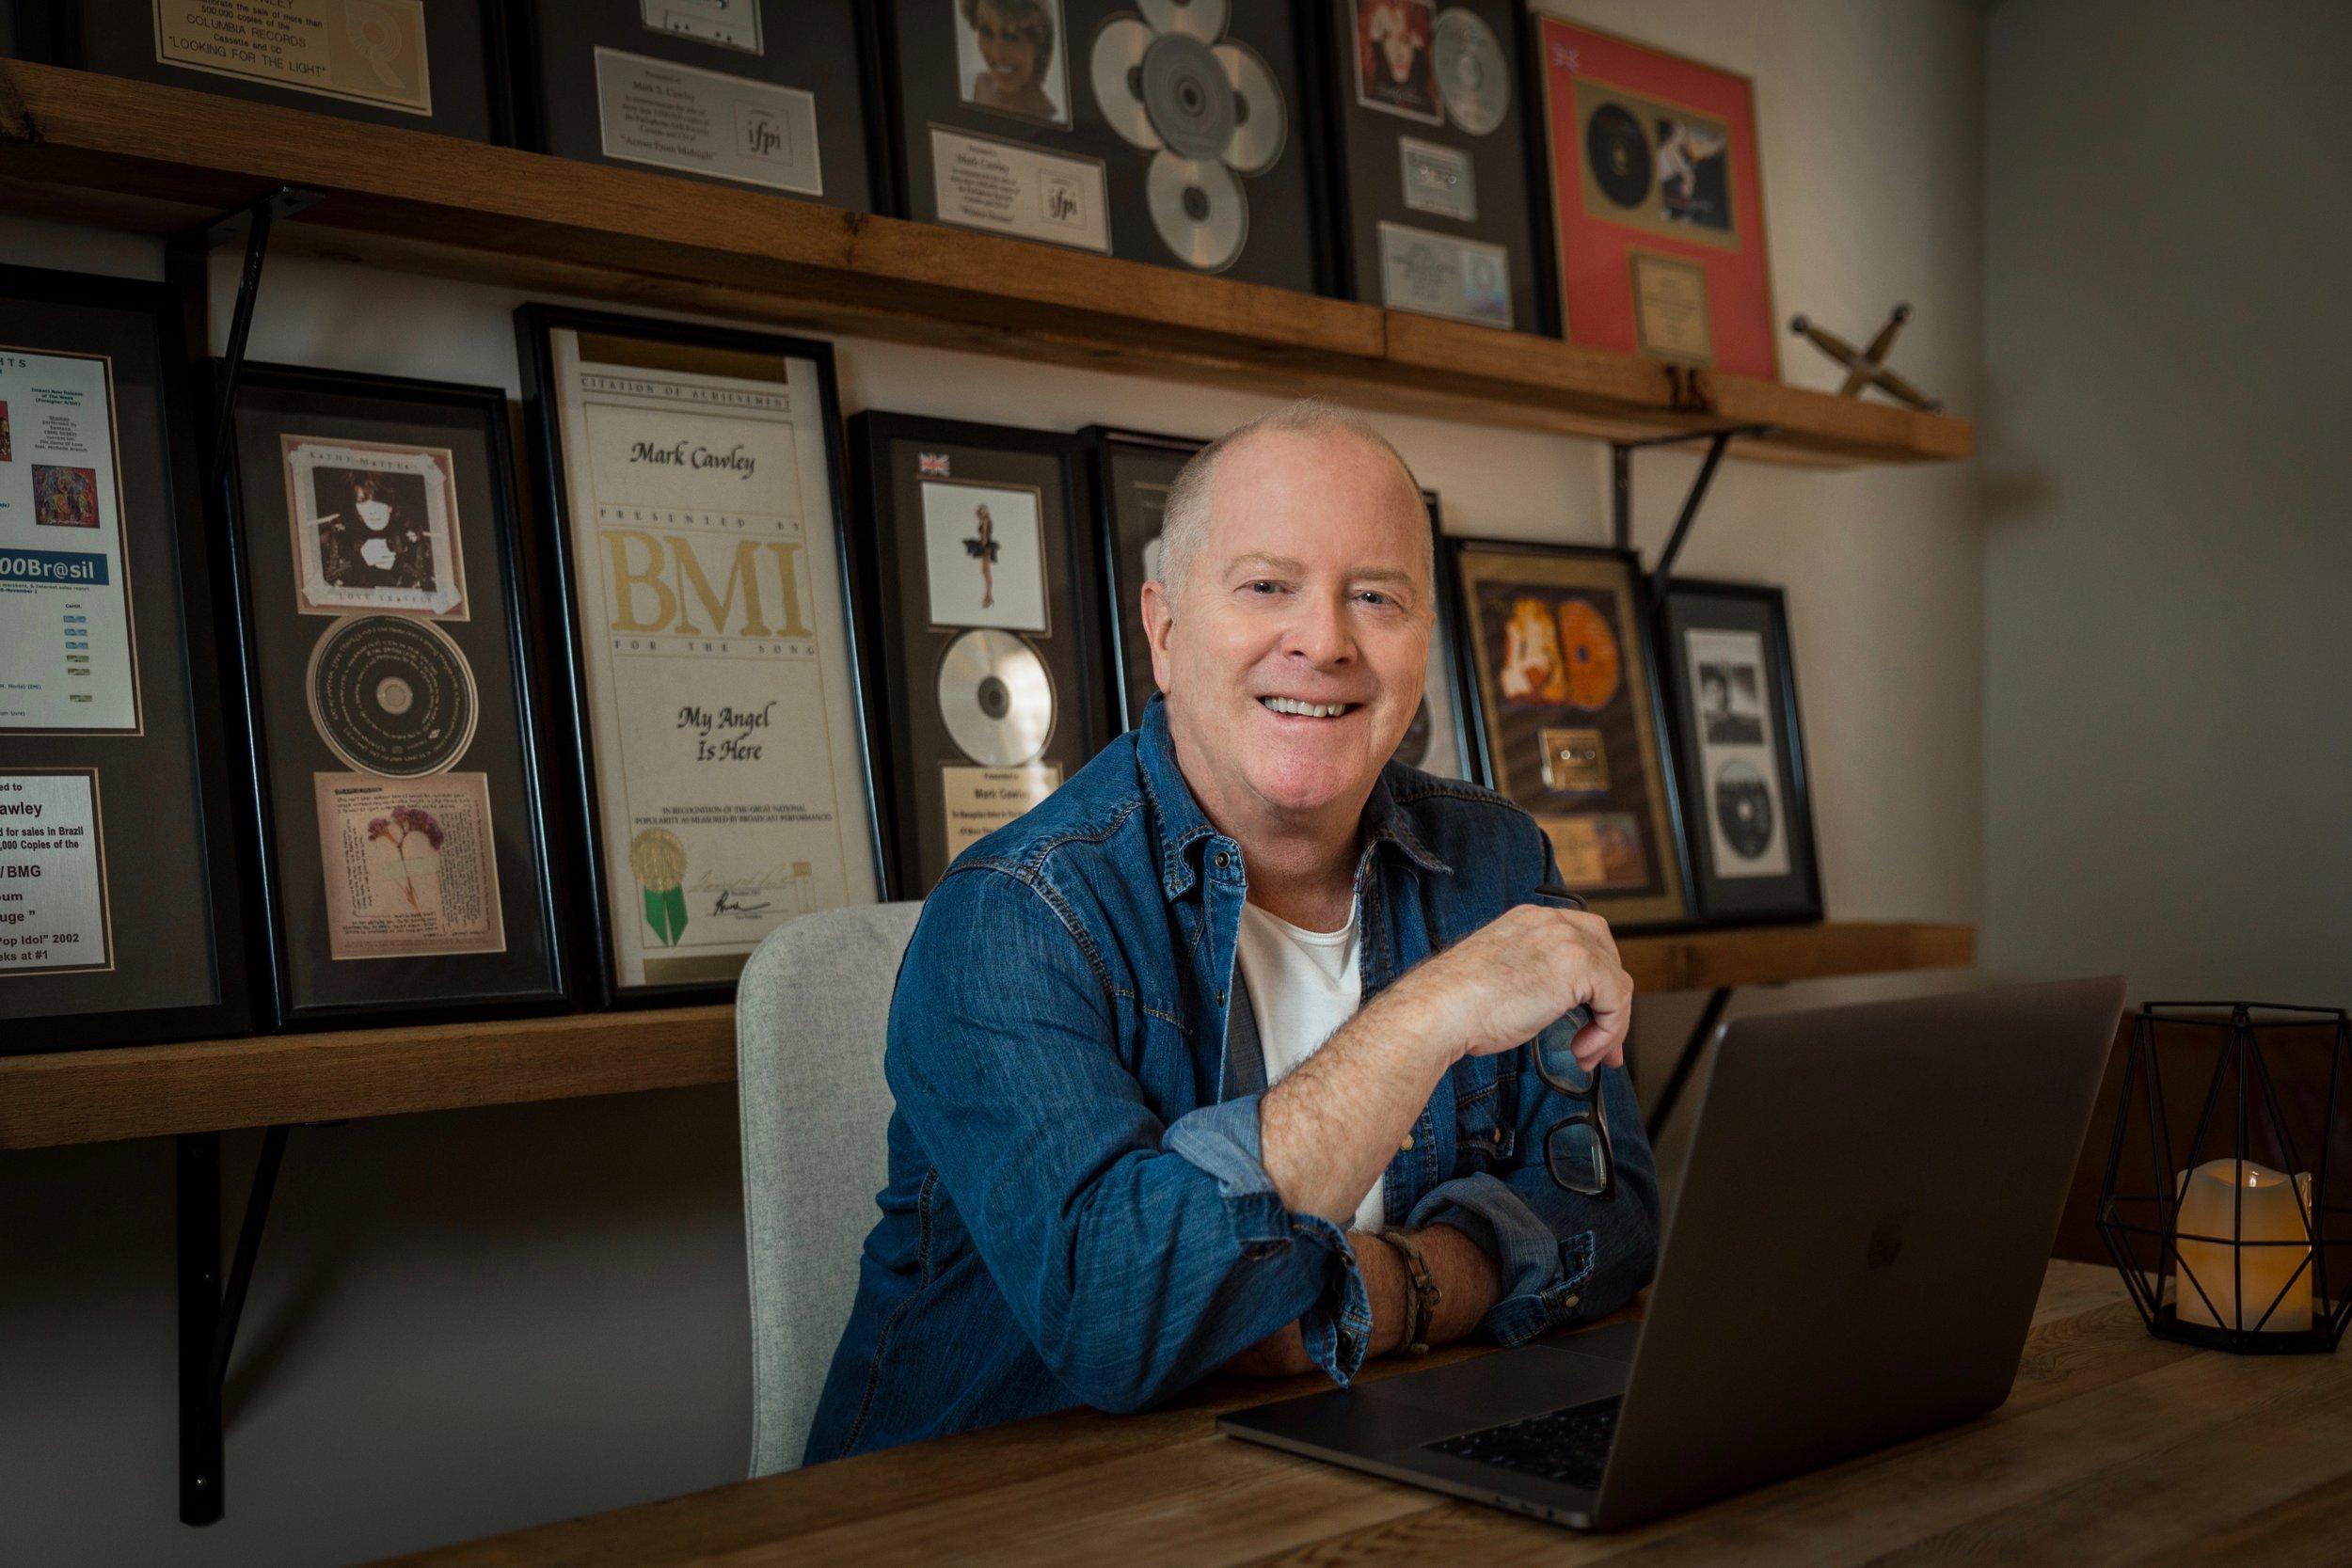 Mark Cawley iDoCoach.com